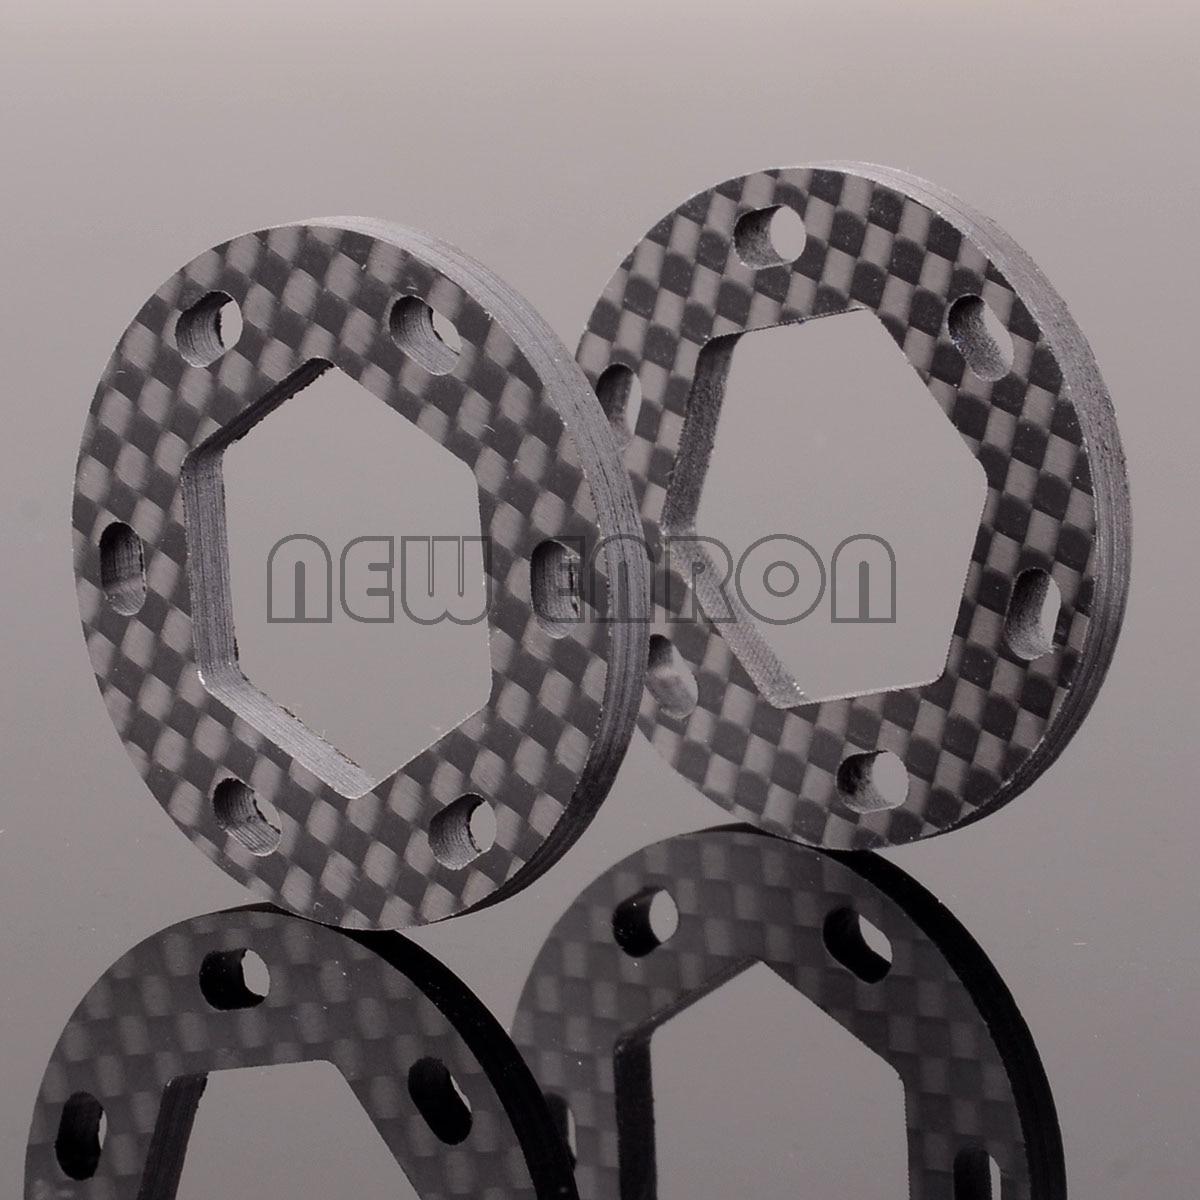 NEW ENRON 2P Carbon Fiber DUAL FIBERGLASS BRAKE DISK 19x35x3mm HPI 87055 SAVAGE X 4.6 5.9